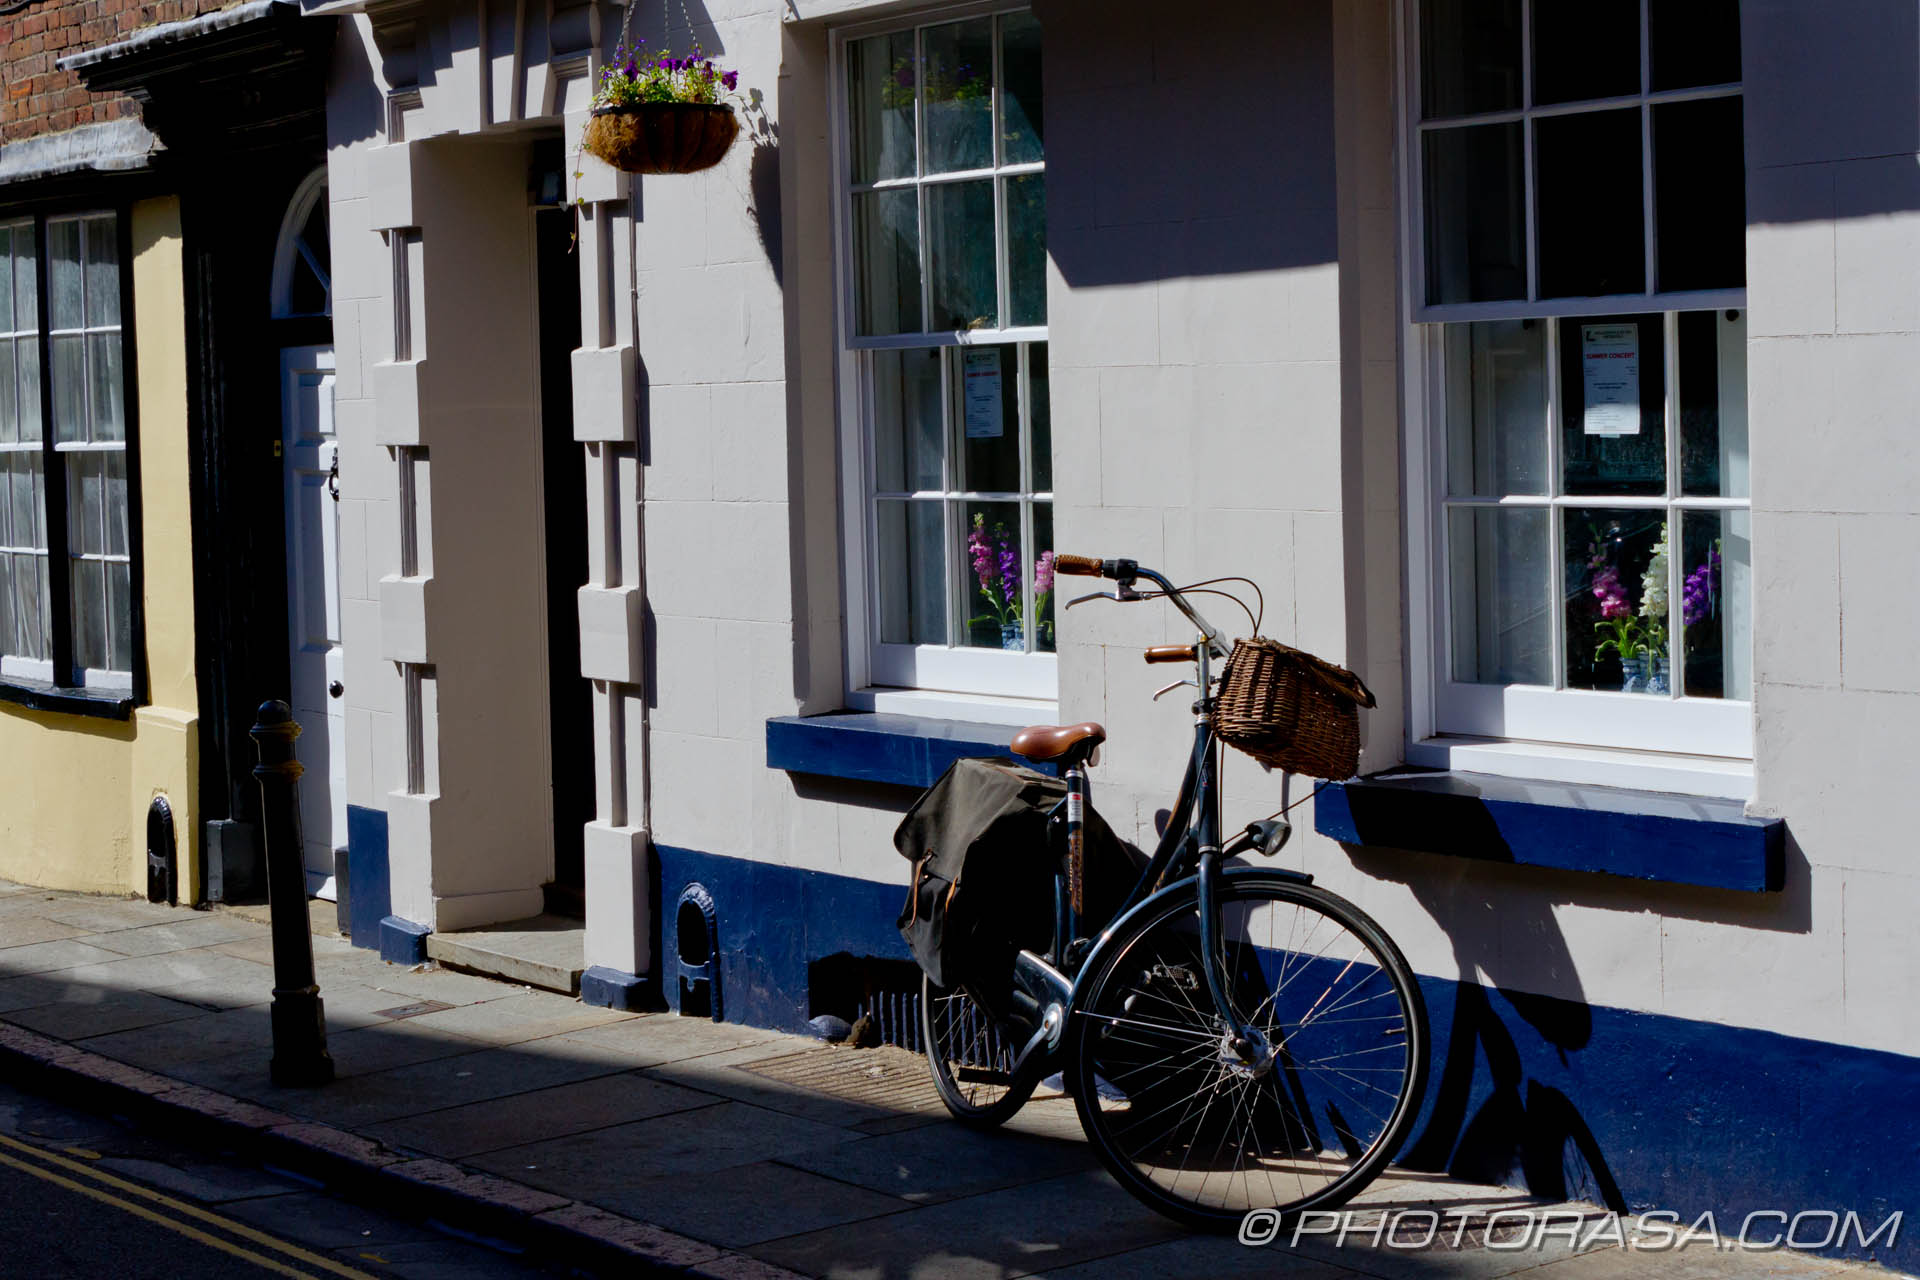 http://photorasa.com/canterbury-trip/pushbike-outside-house/